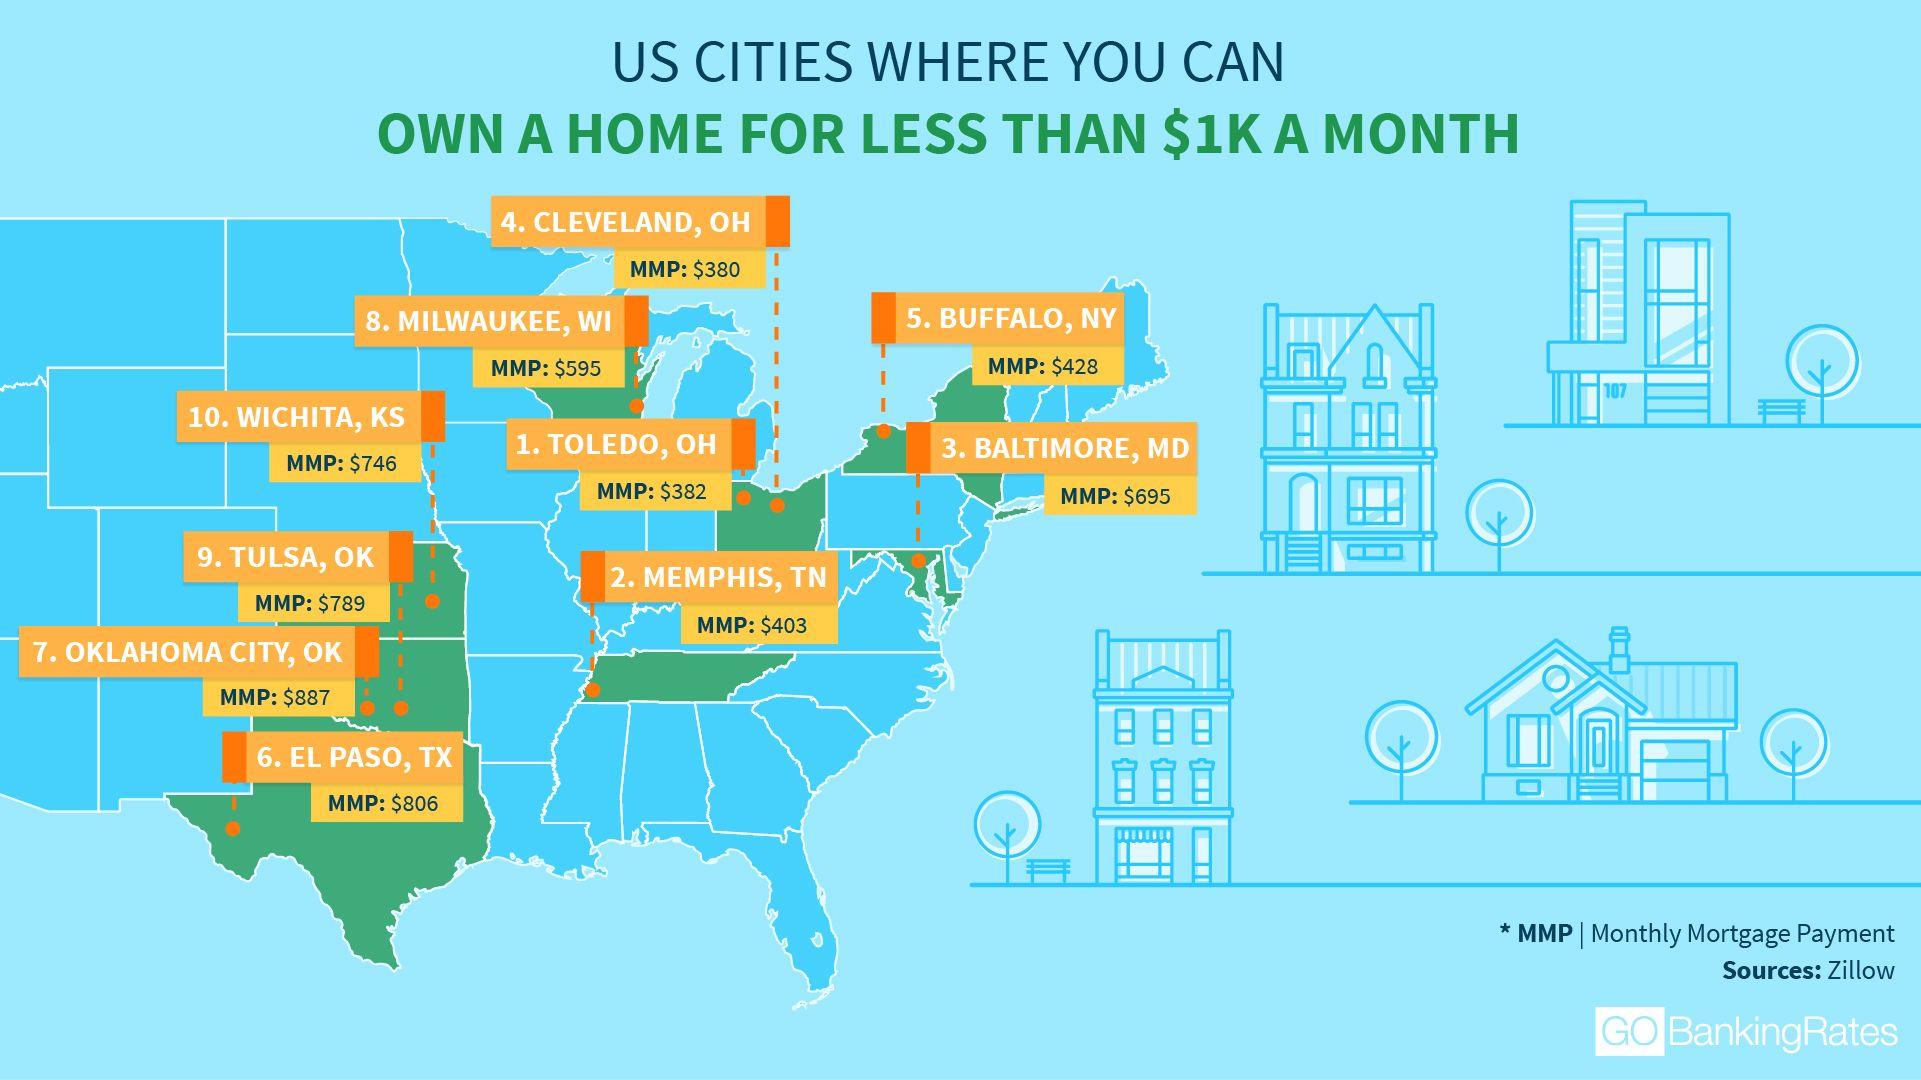 cities less than 1K map DICKLER 041618 EC